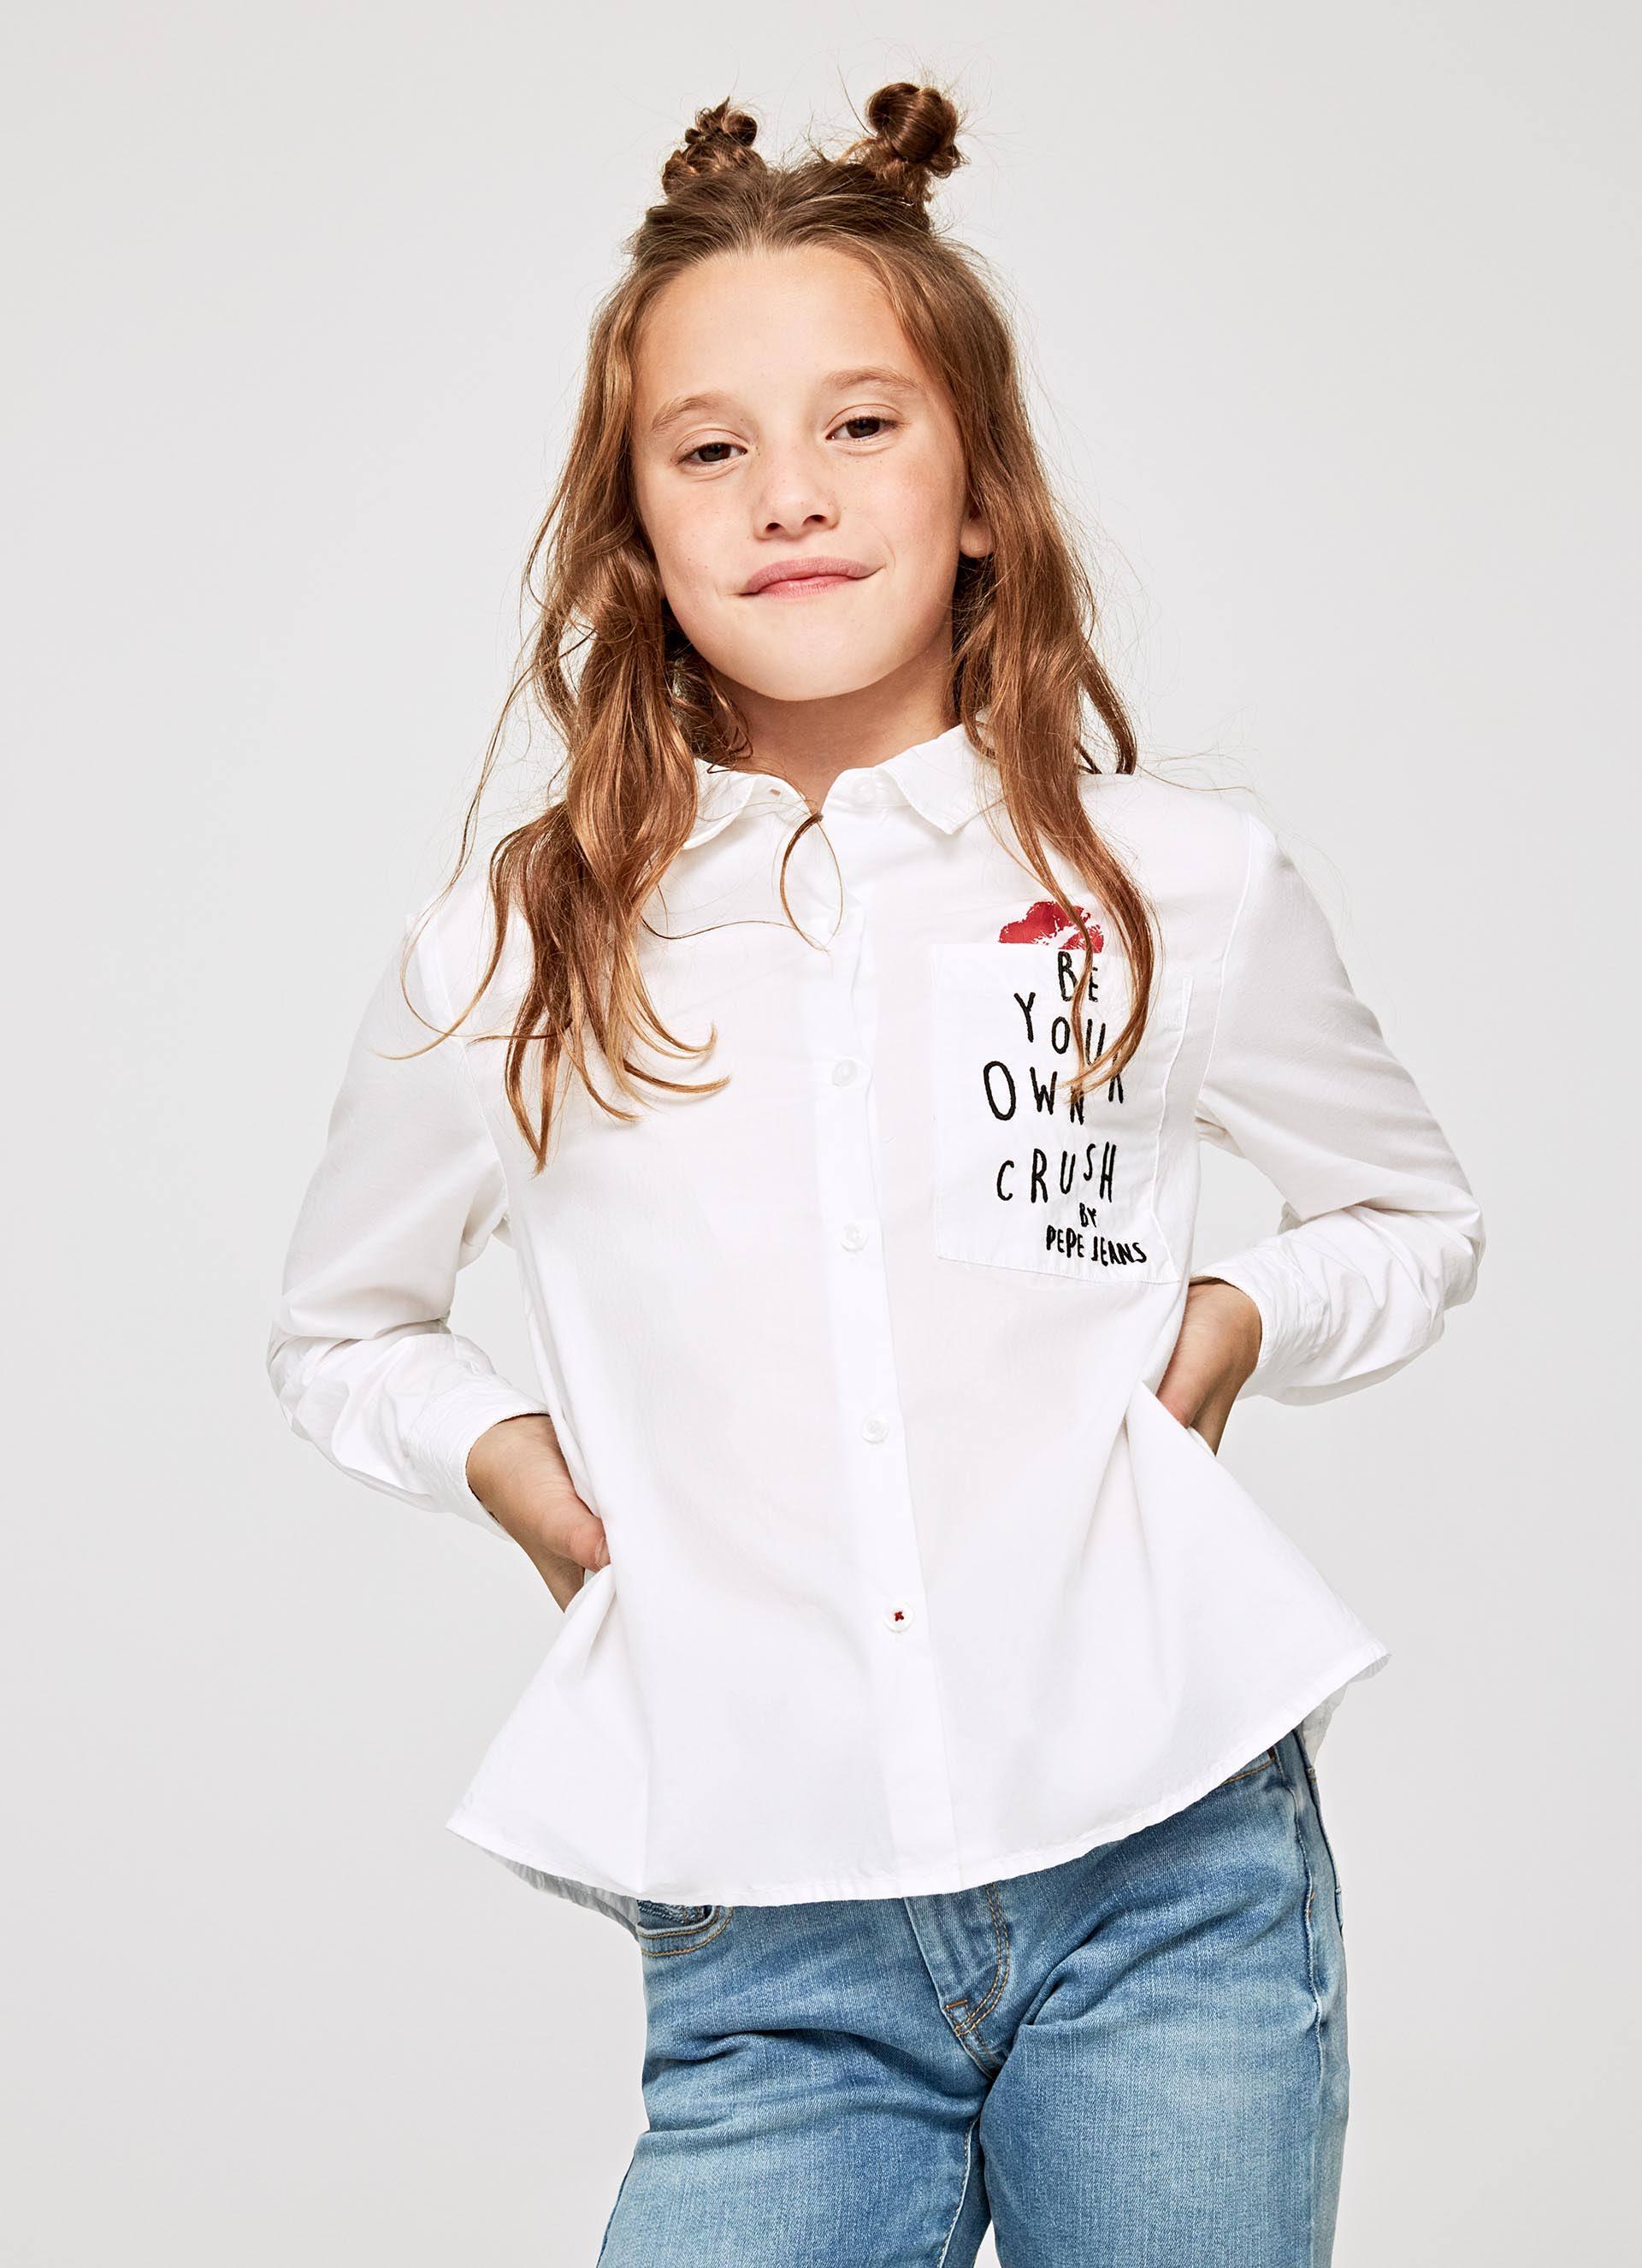 Infantil Claire Jeans Jeans Camisa Pepe Camisa Claire Jeans Infantil Pepe Claire Pepe Camisa qwvA7C7